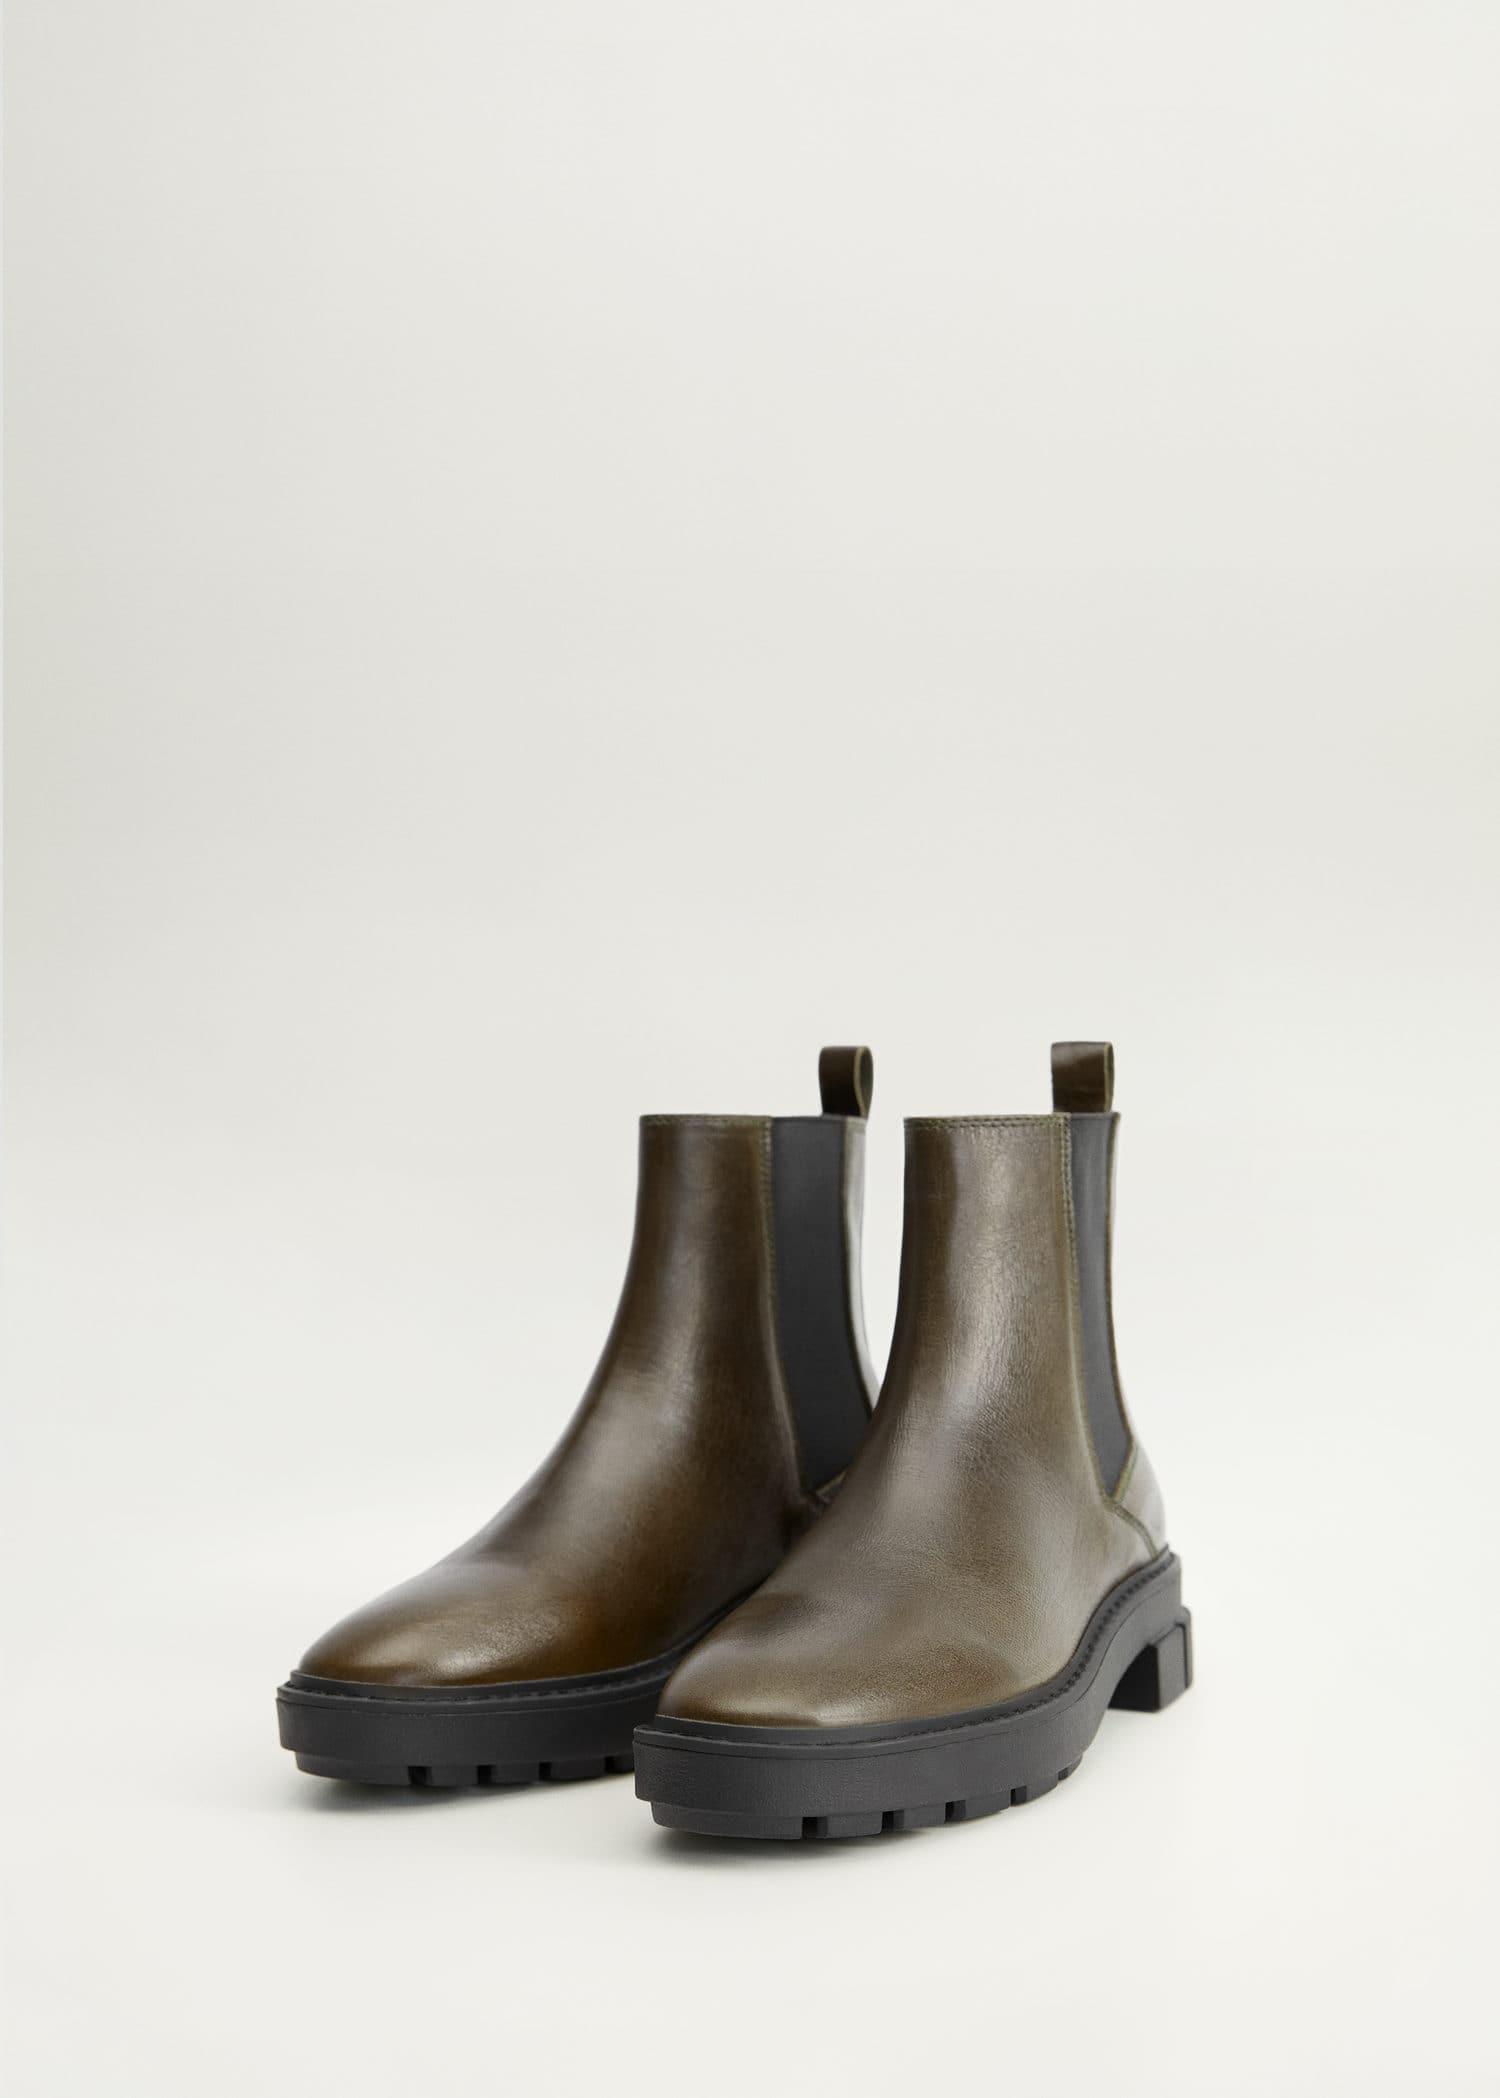 Stiefeletten, Leder, Schuhe, Stiefel, 40, Pistol Boots